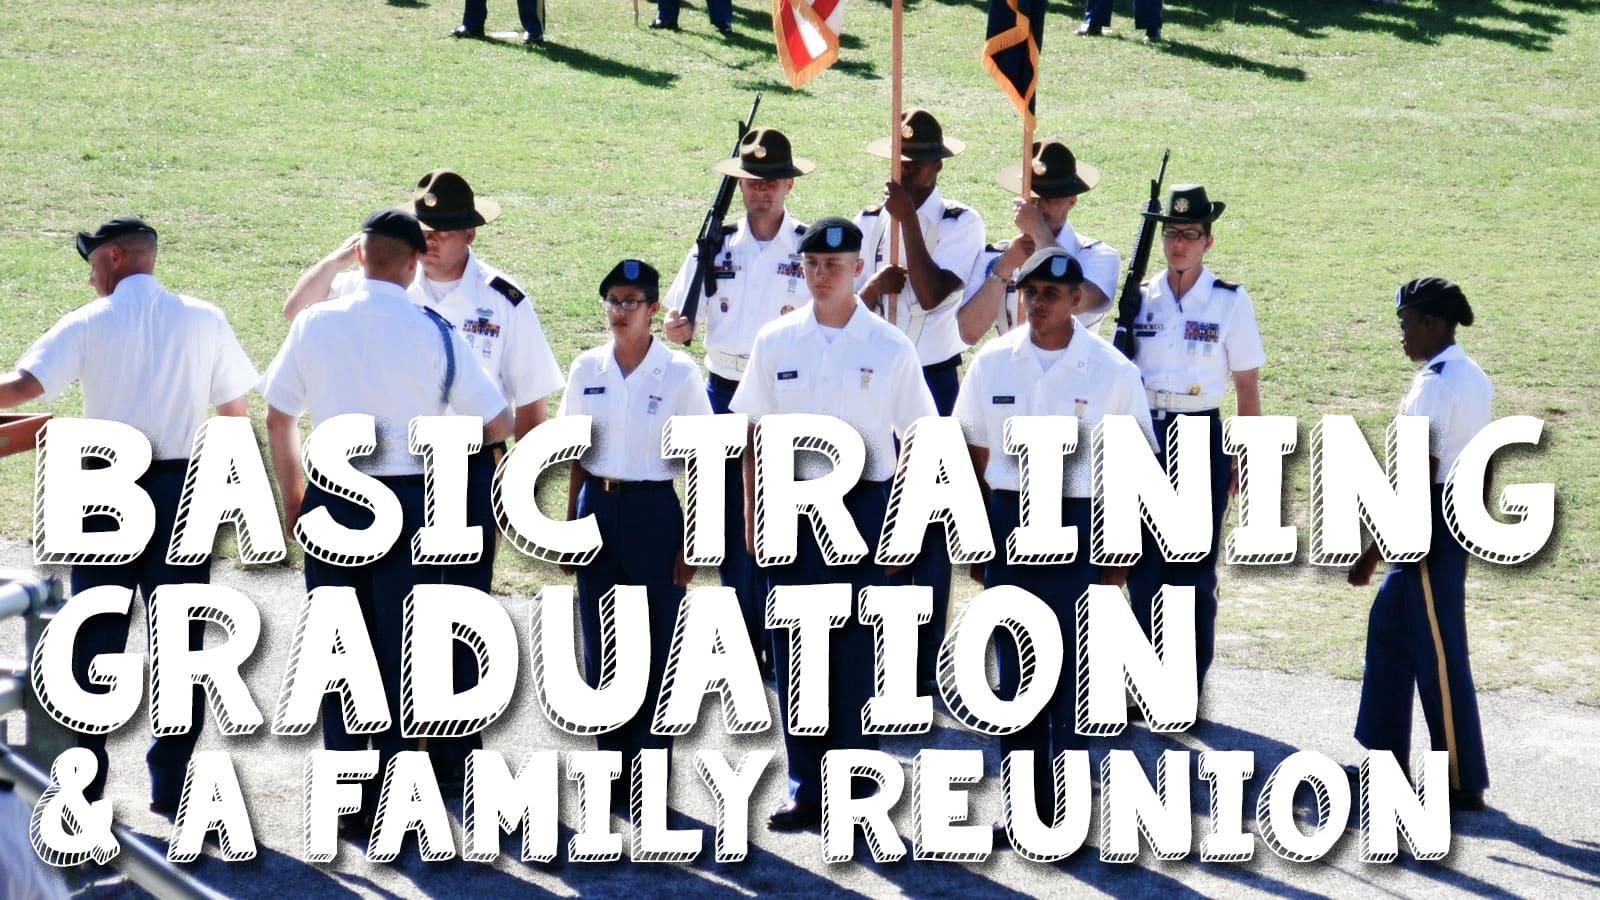 Basic Training Graduation & a Family Reunion